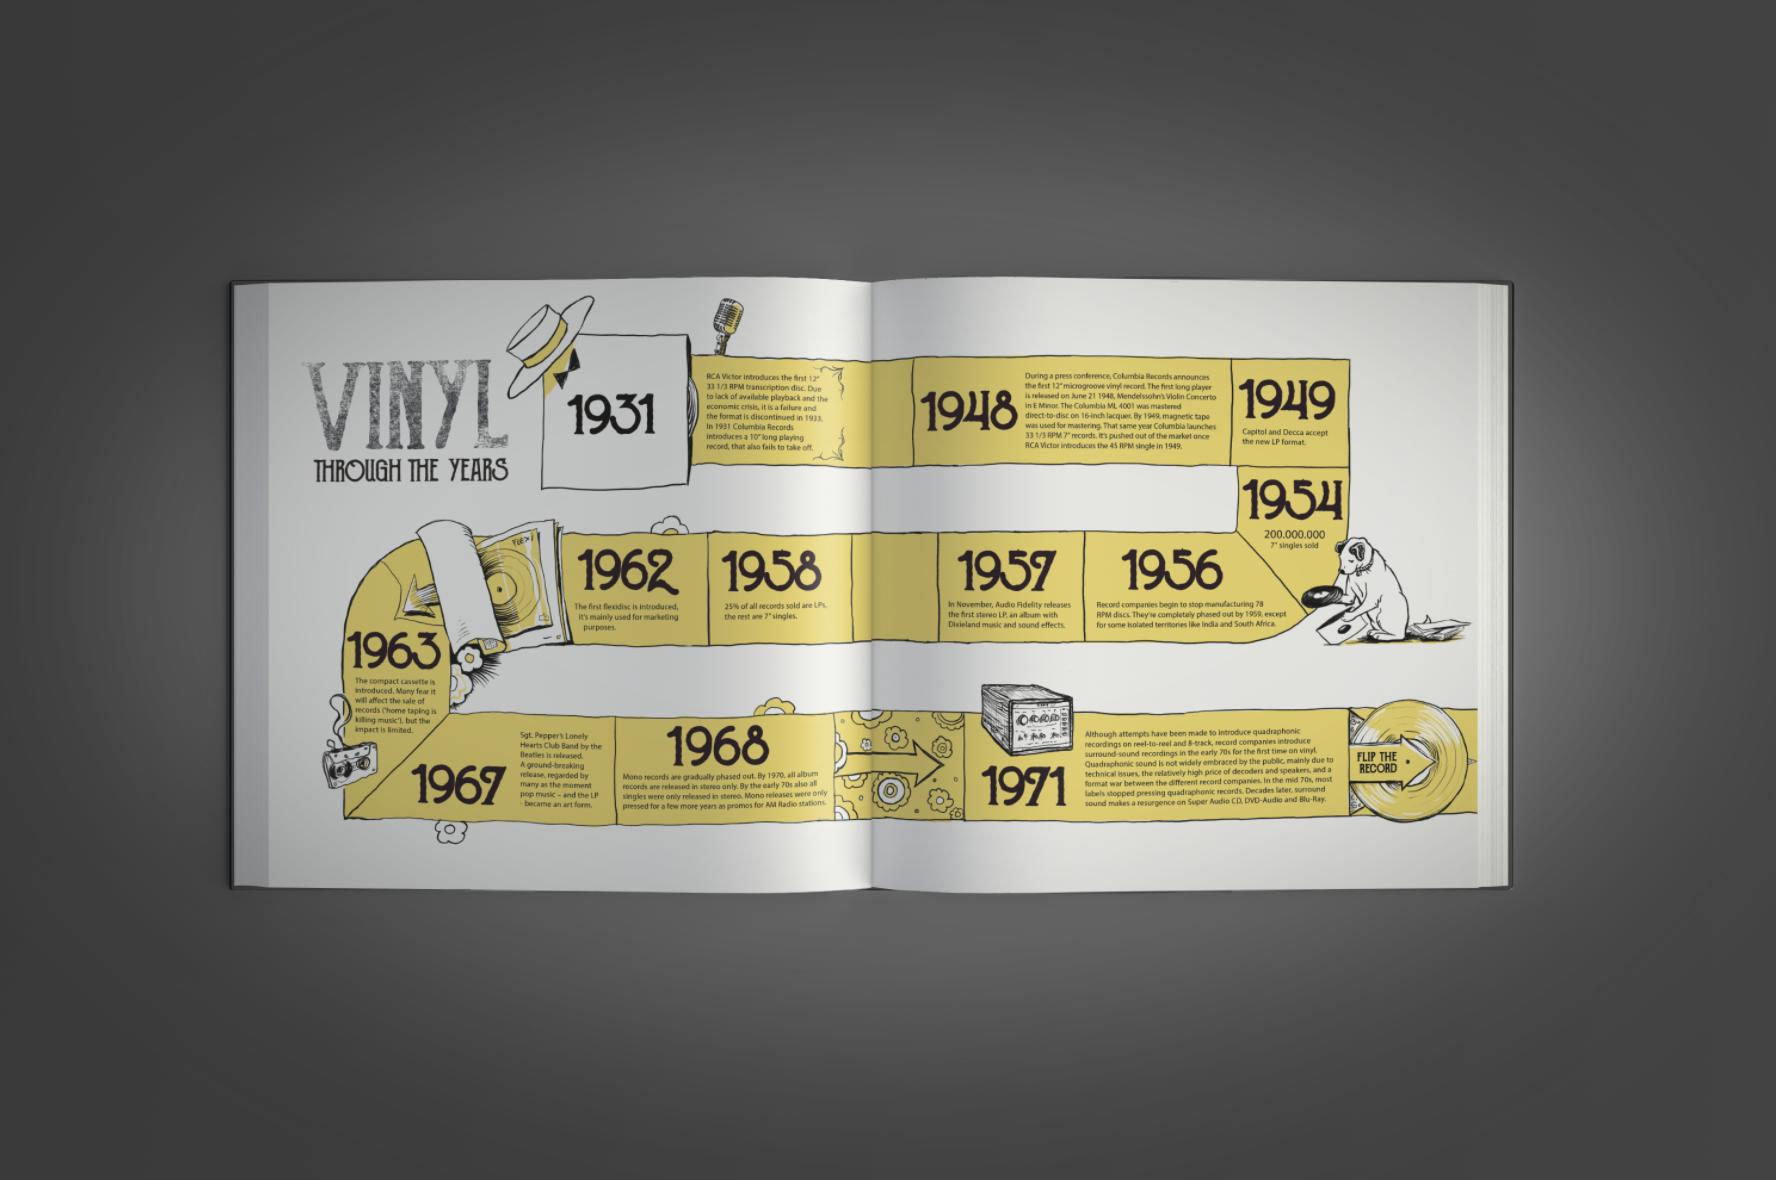 Passion for Vinyl Timeline